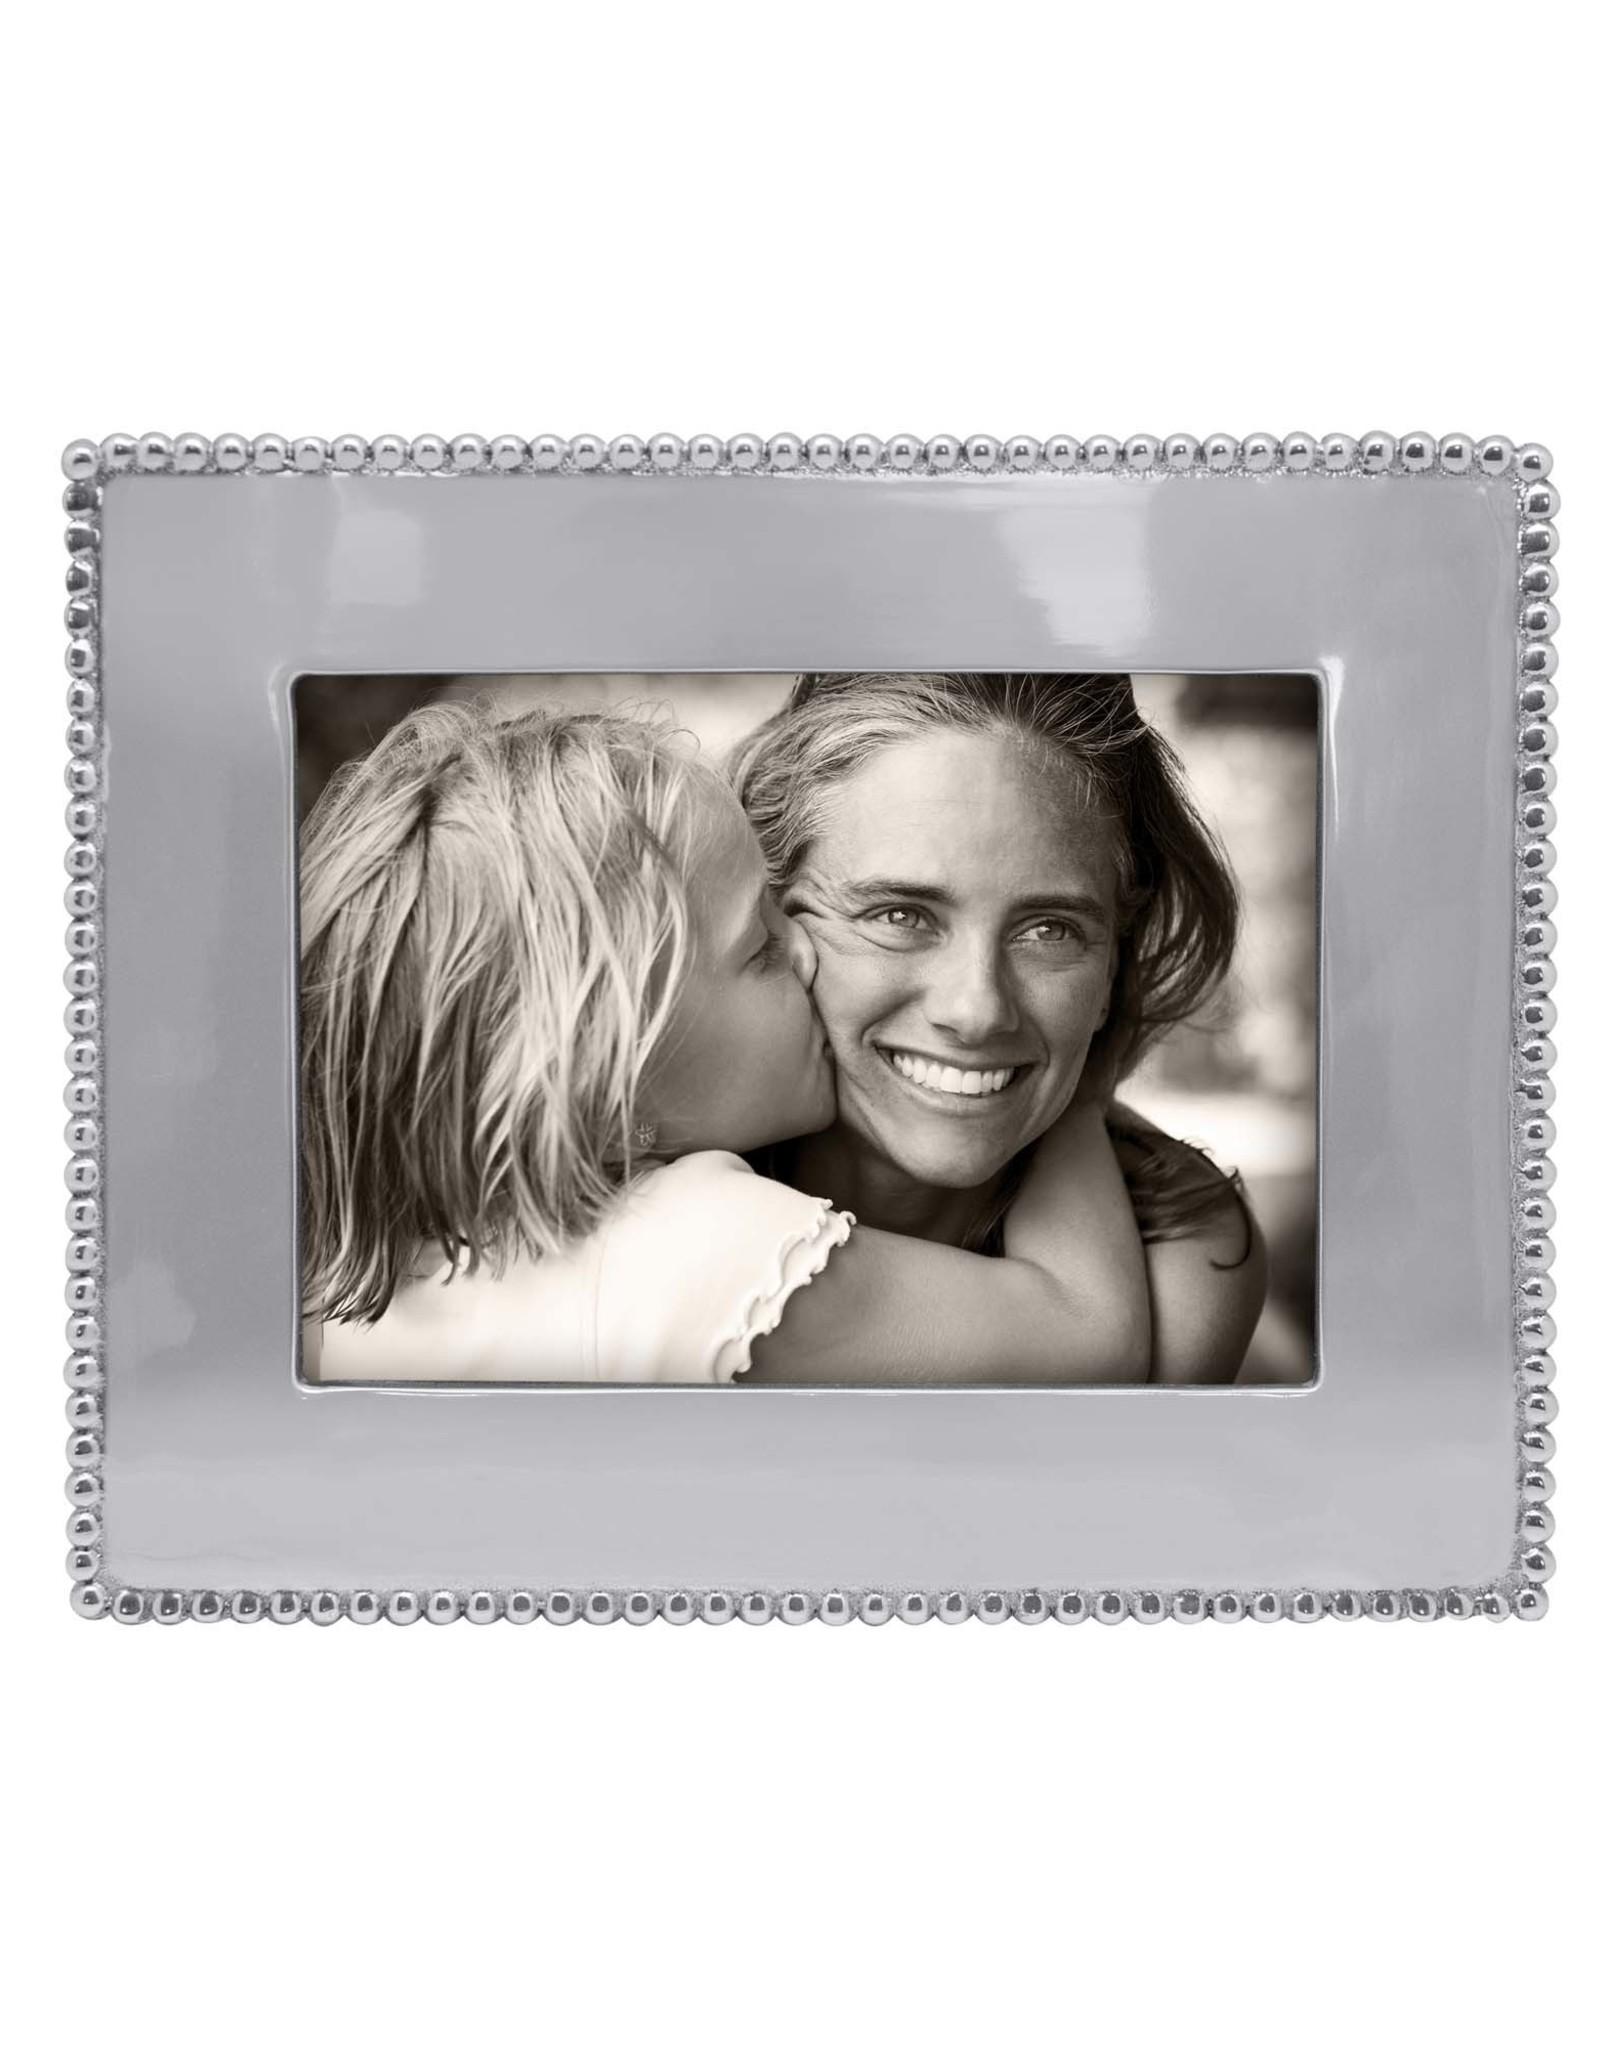 Mariposa Beaded 5x7 Engraveable Frame